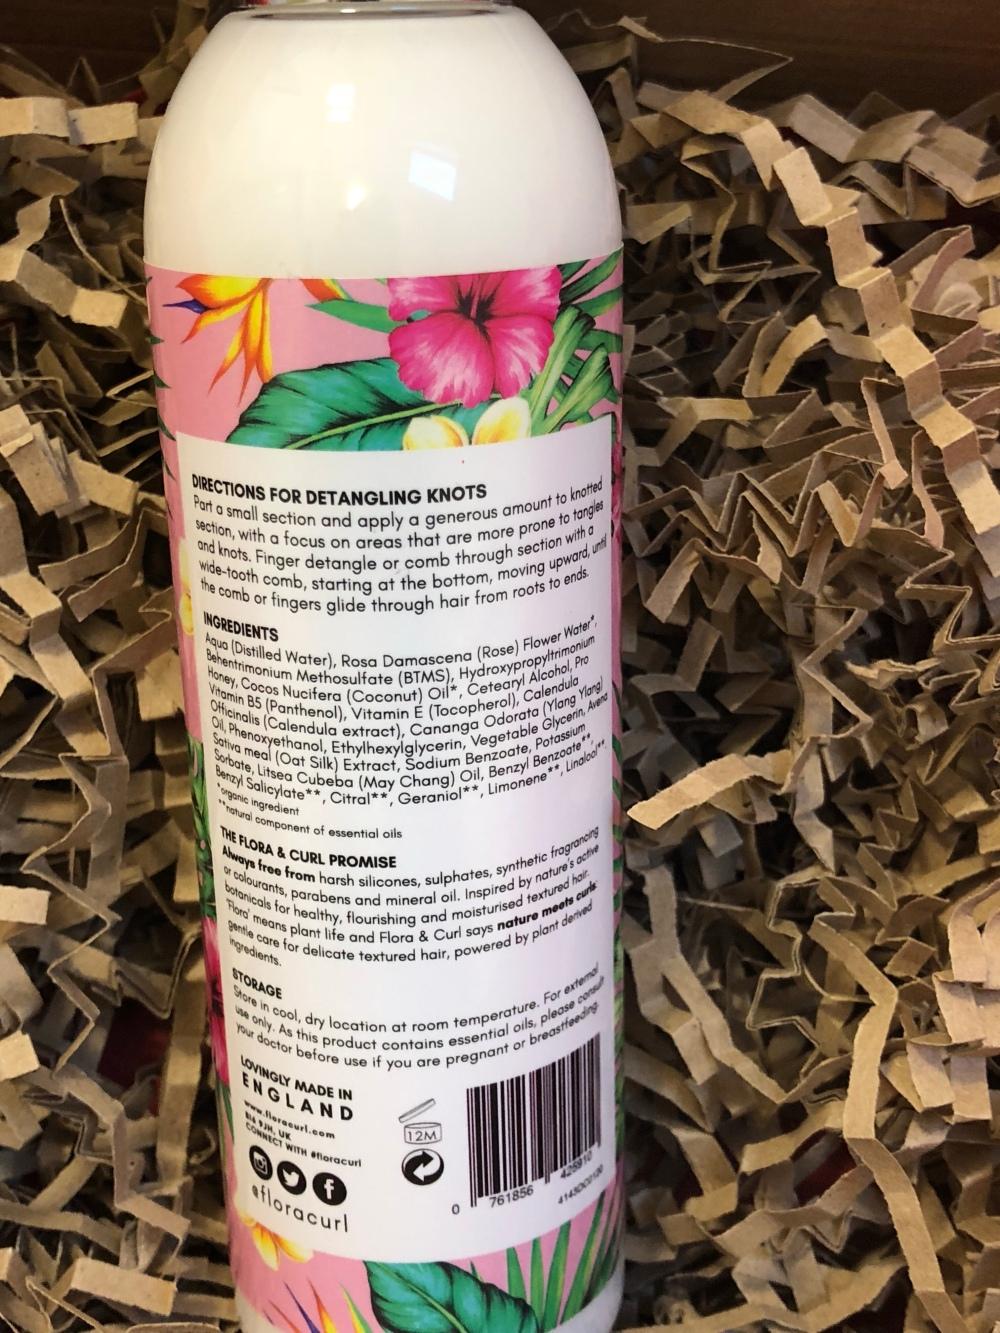 Flora & curl Organic rose & Honey Milk Leave-in detangler